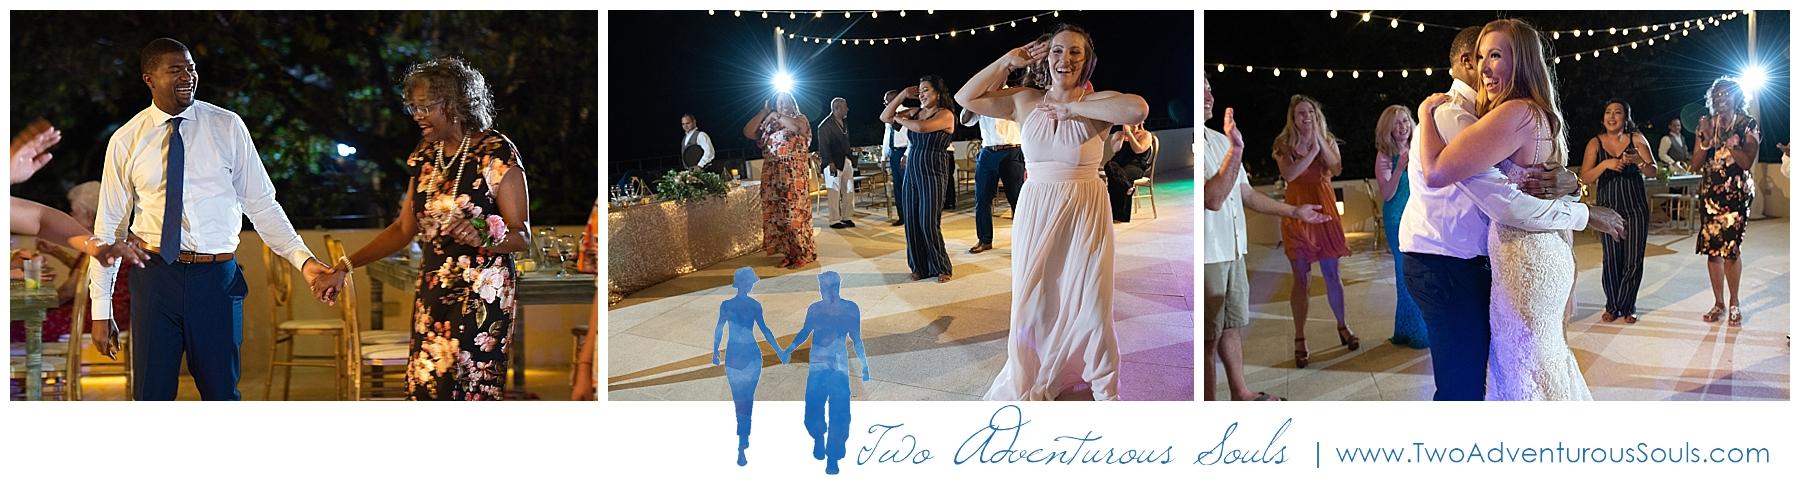 Costa Rica Wedding Photographers, Dreams las Mareas Wedding, Destination Wedding Photographers, Two Adventurous Souls - 022219_0047.jpg